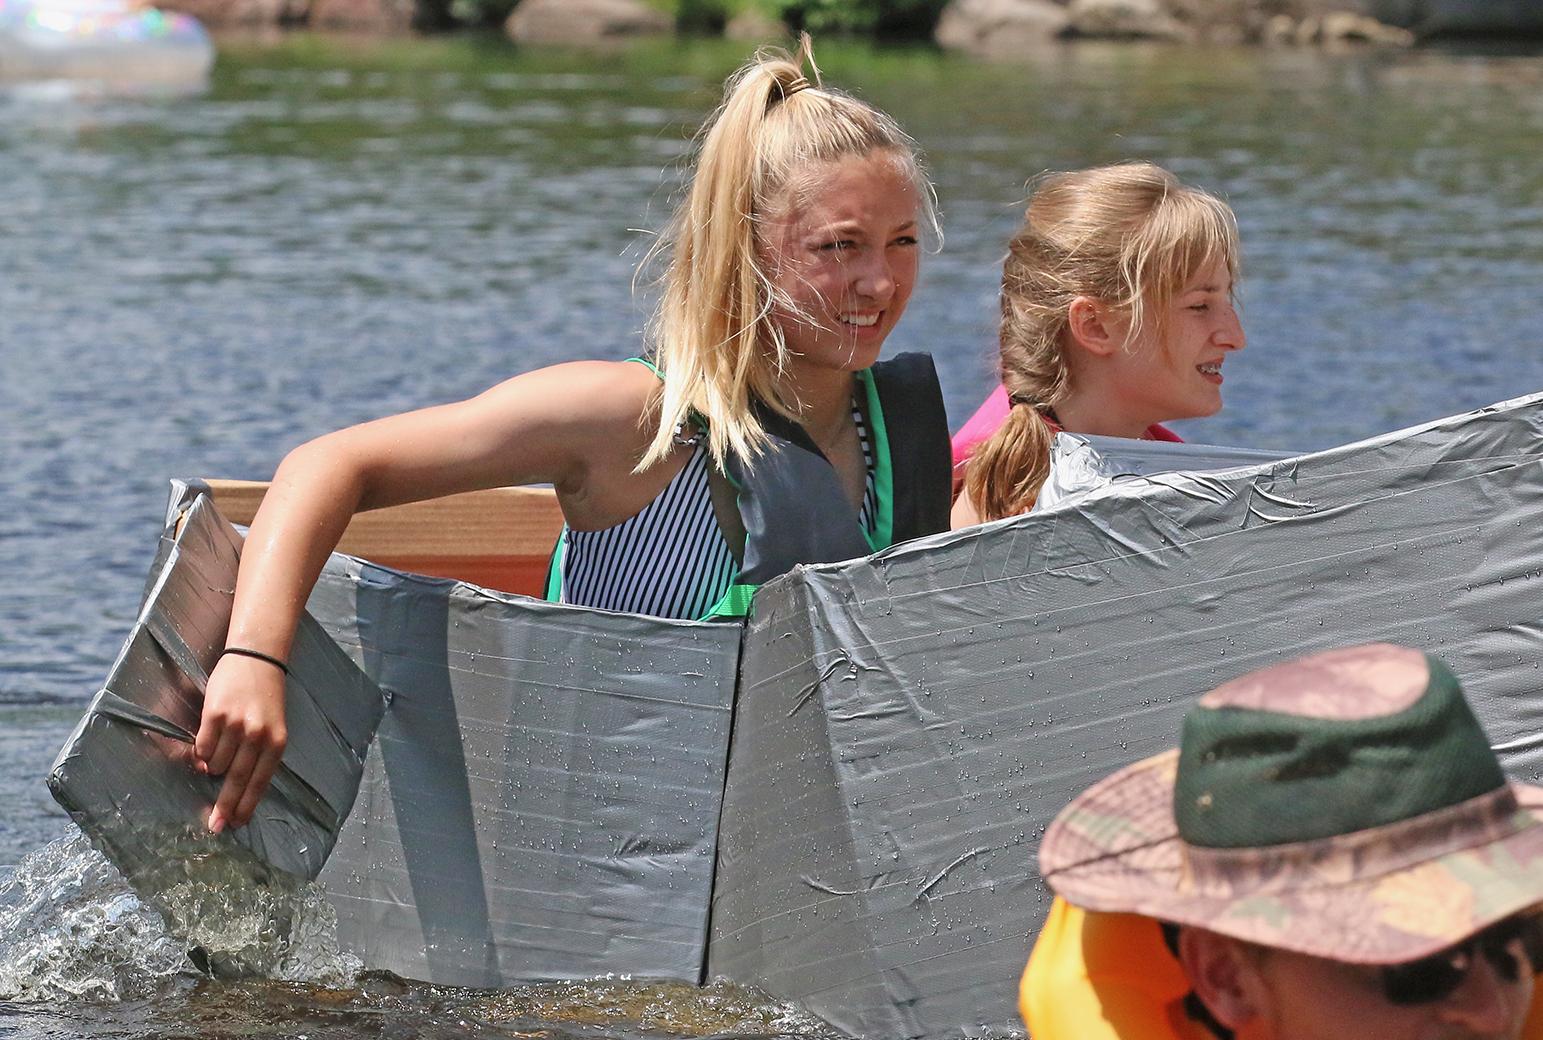 Paige Danen, left, and Sami Danen came in second in the cardboard regatta at Tilleda Falls — a small, private campground near Gresham.Carol Ryczek   NEW Media